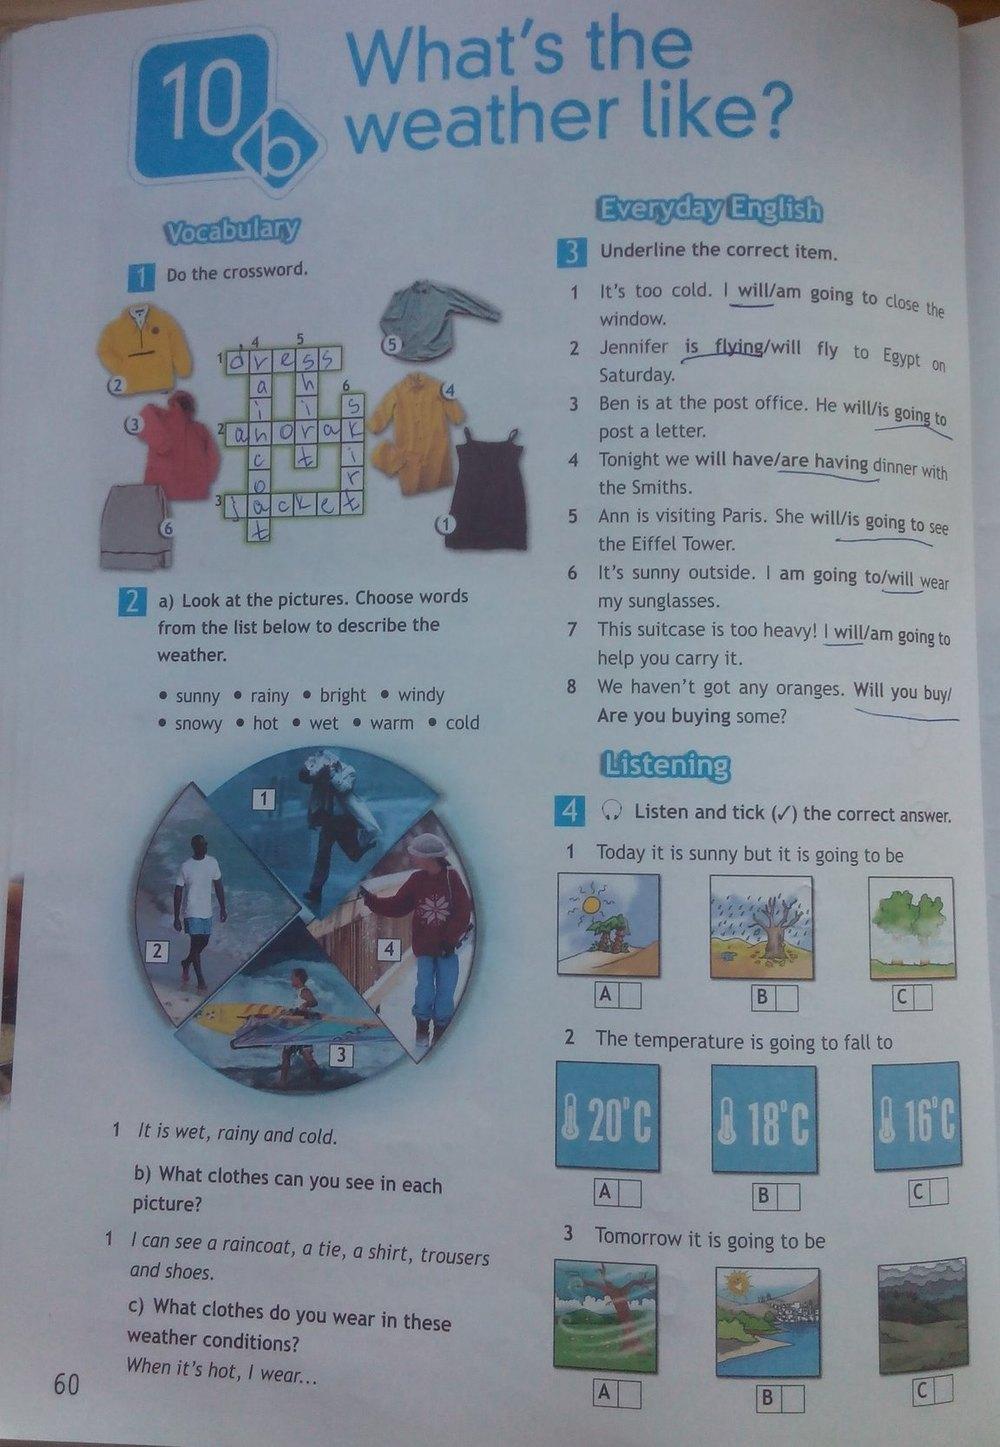 5 класс 6 тетрадь англискому гдз по